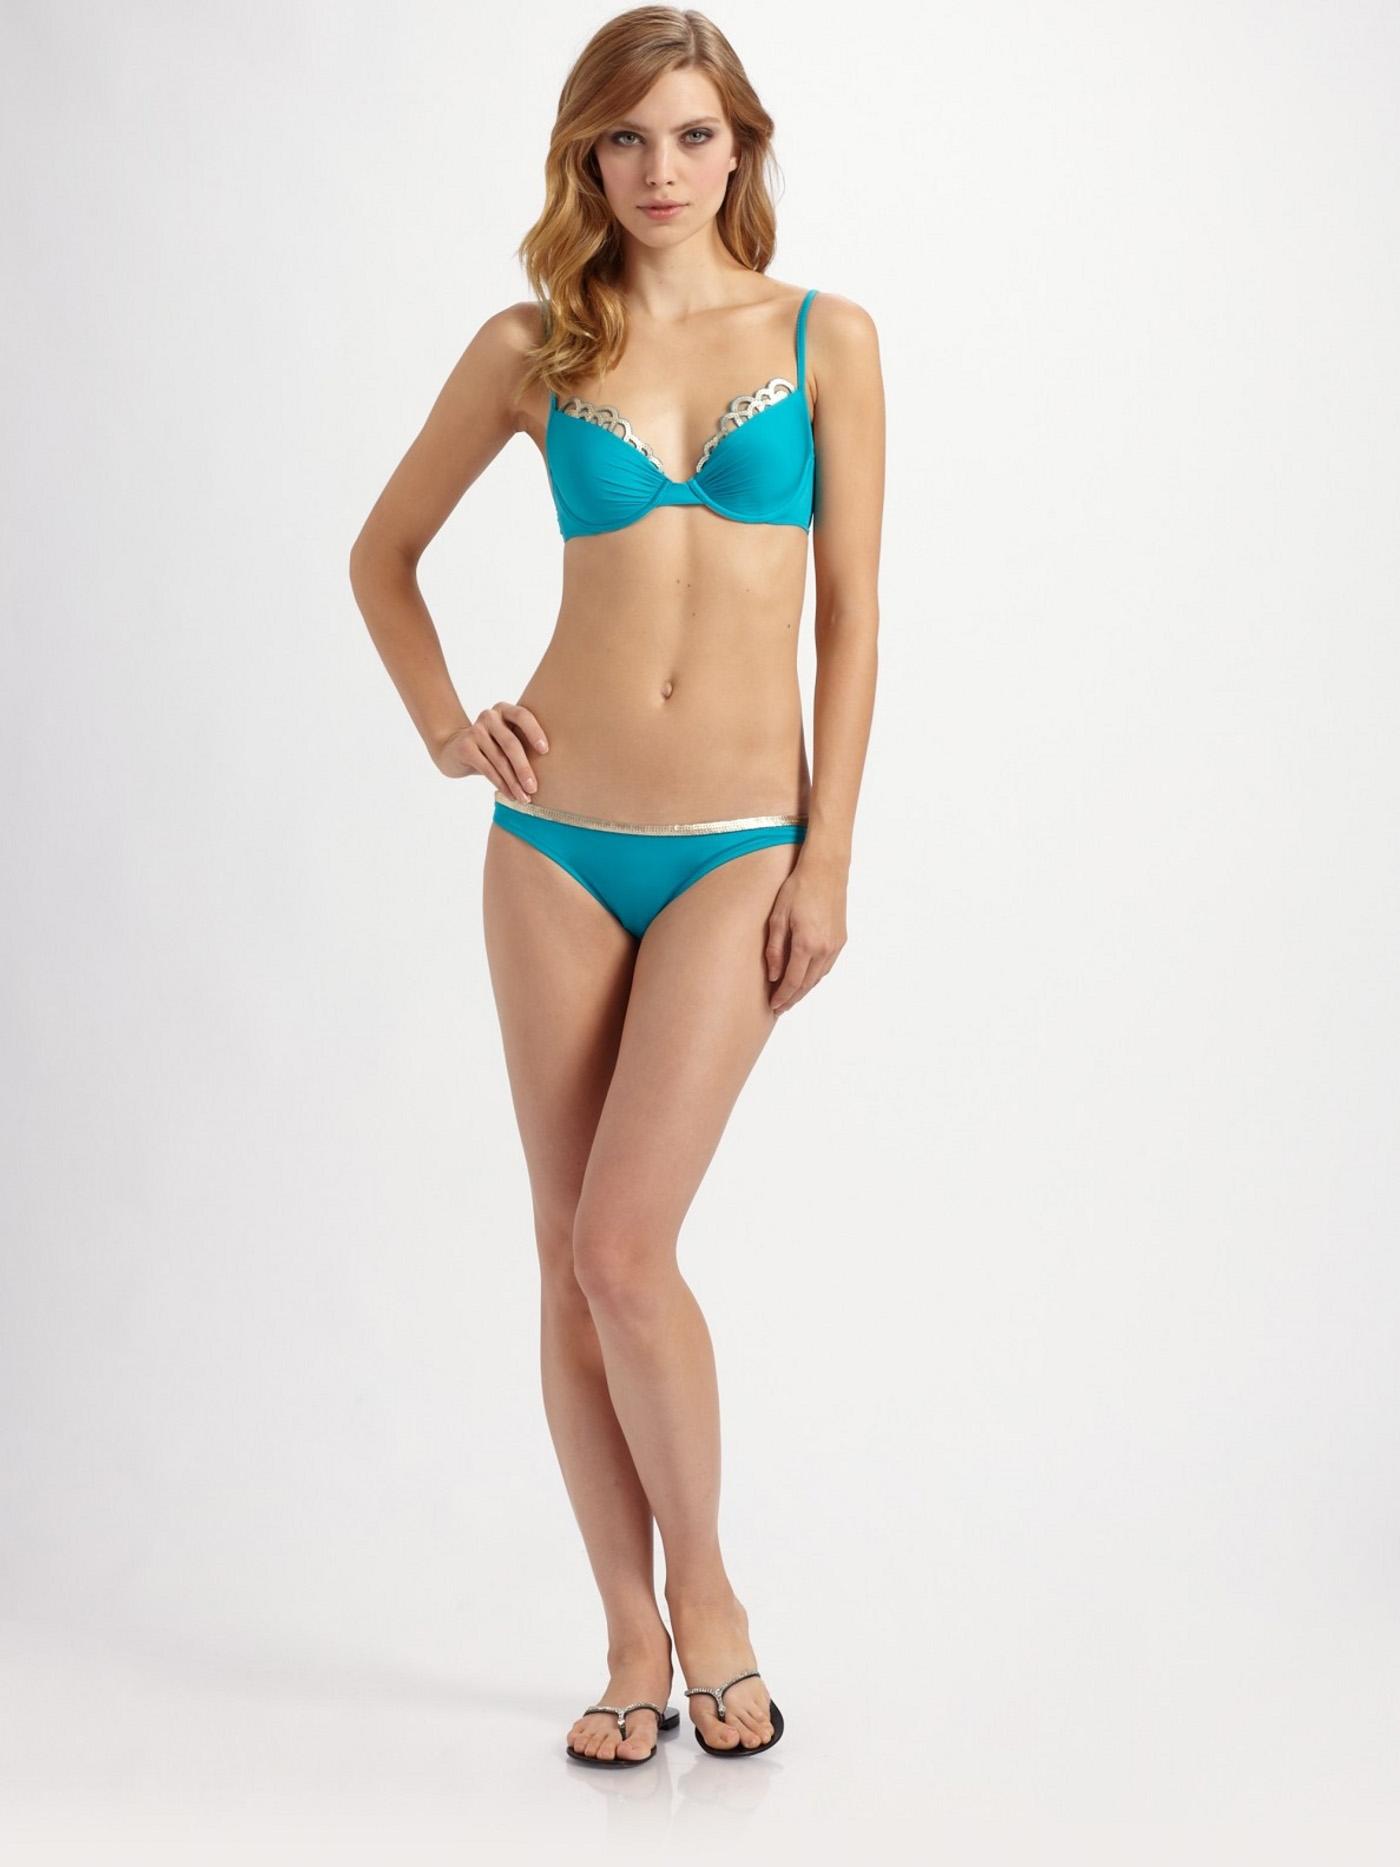 Emily Senko for Saks Fifth Avenue fashion lookbook (Fall 2010) photo shoot